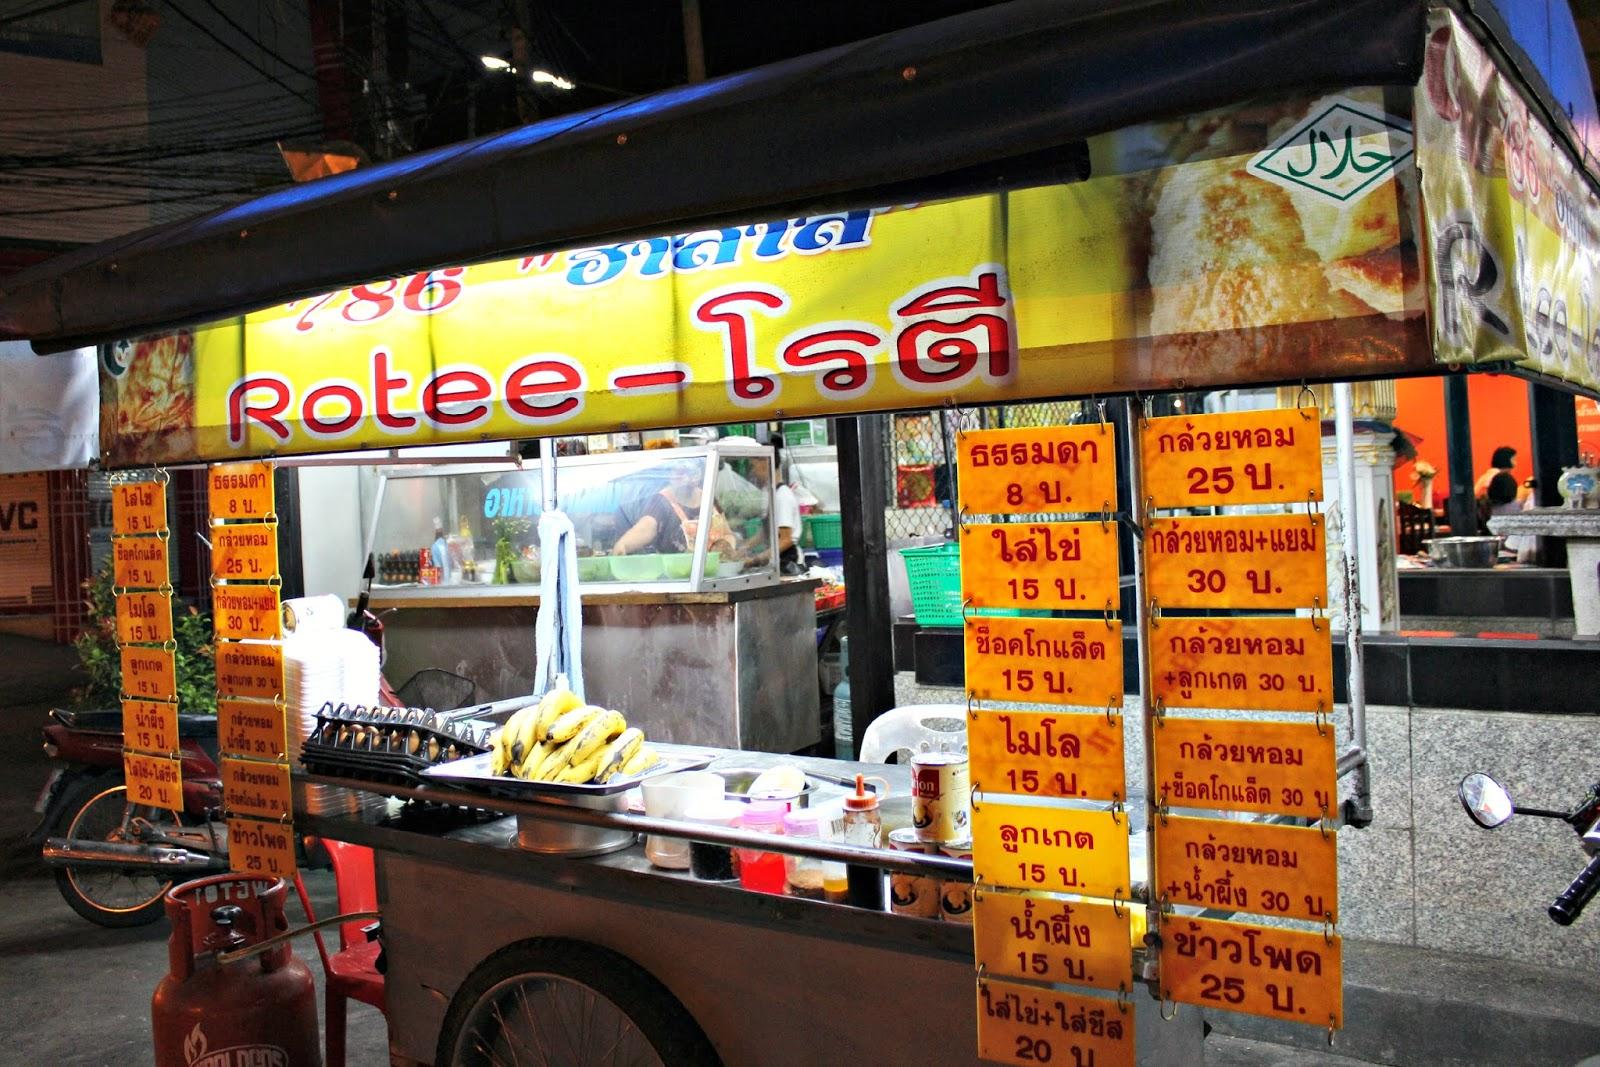 sweet Thai dessert roti rotee